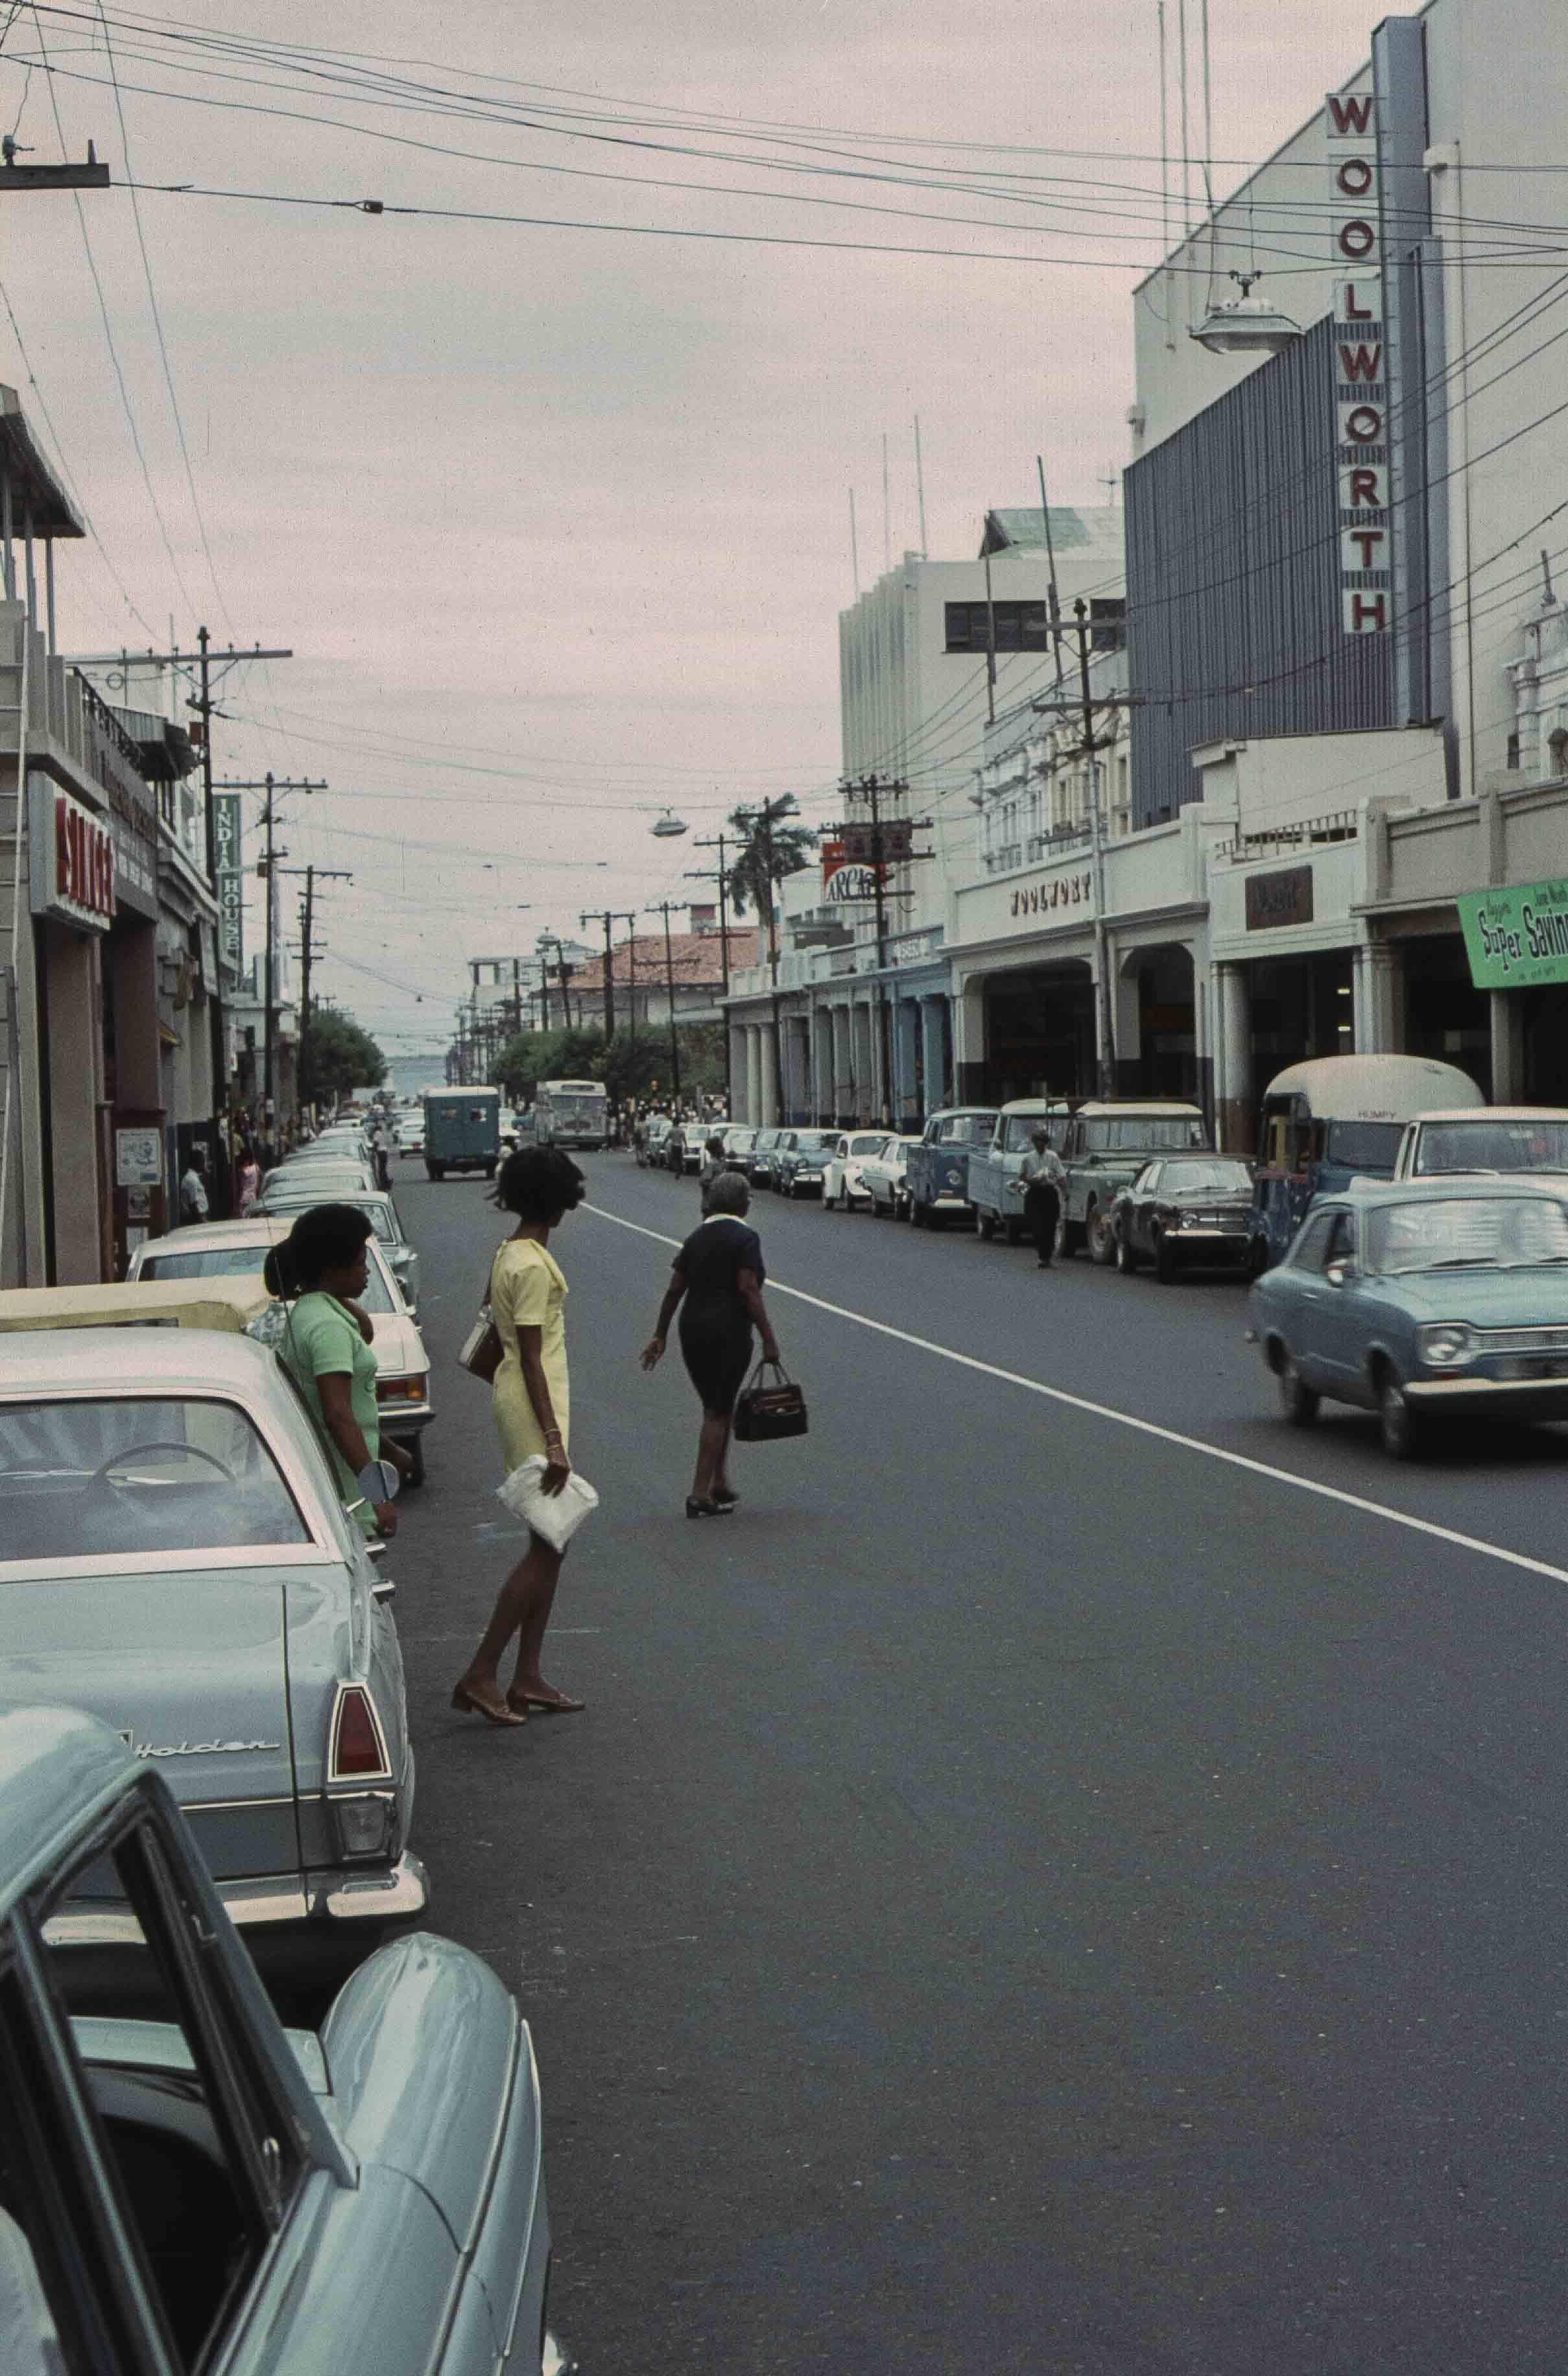 670. Suriname